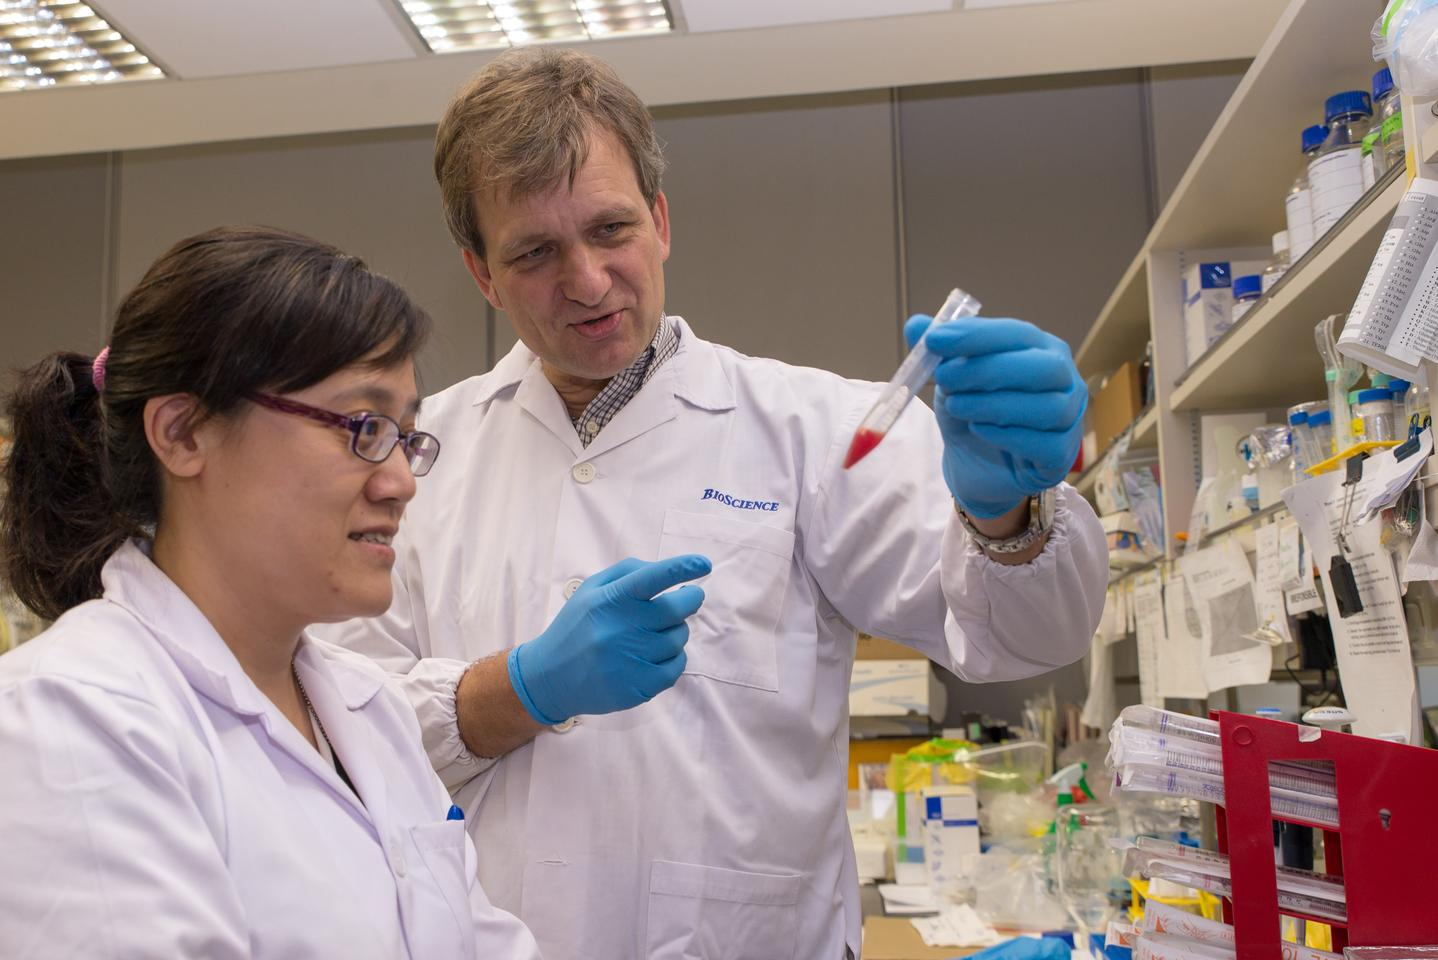 NTU Prof Peter Preiser and scientist Dr Annie Gao